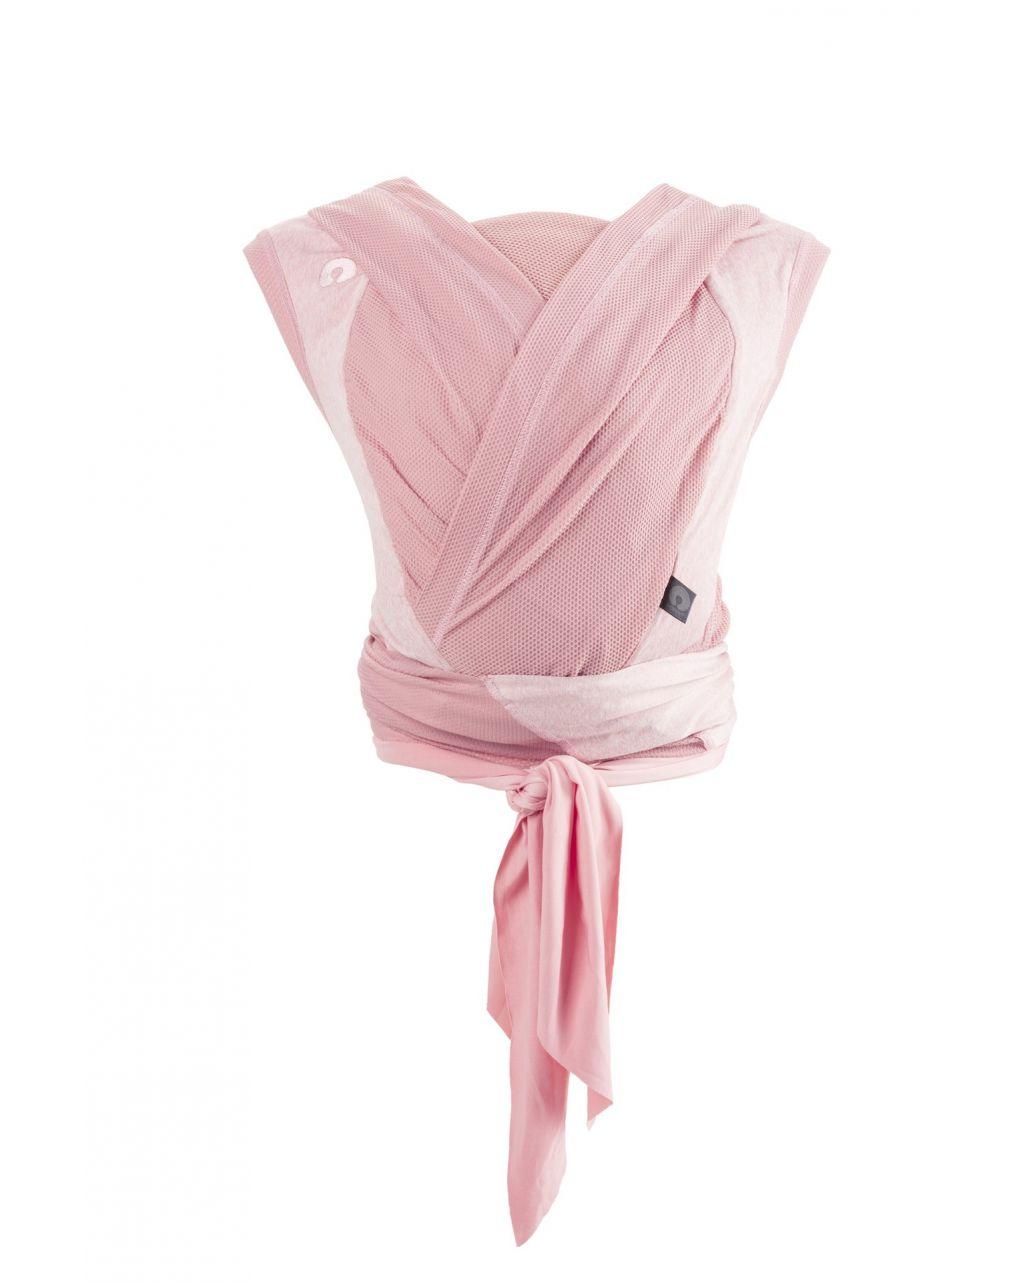 Comfyhug ballerina rose - Boppy